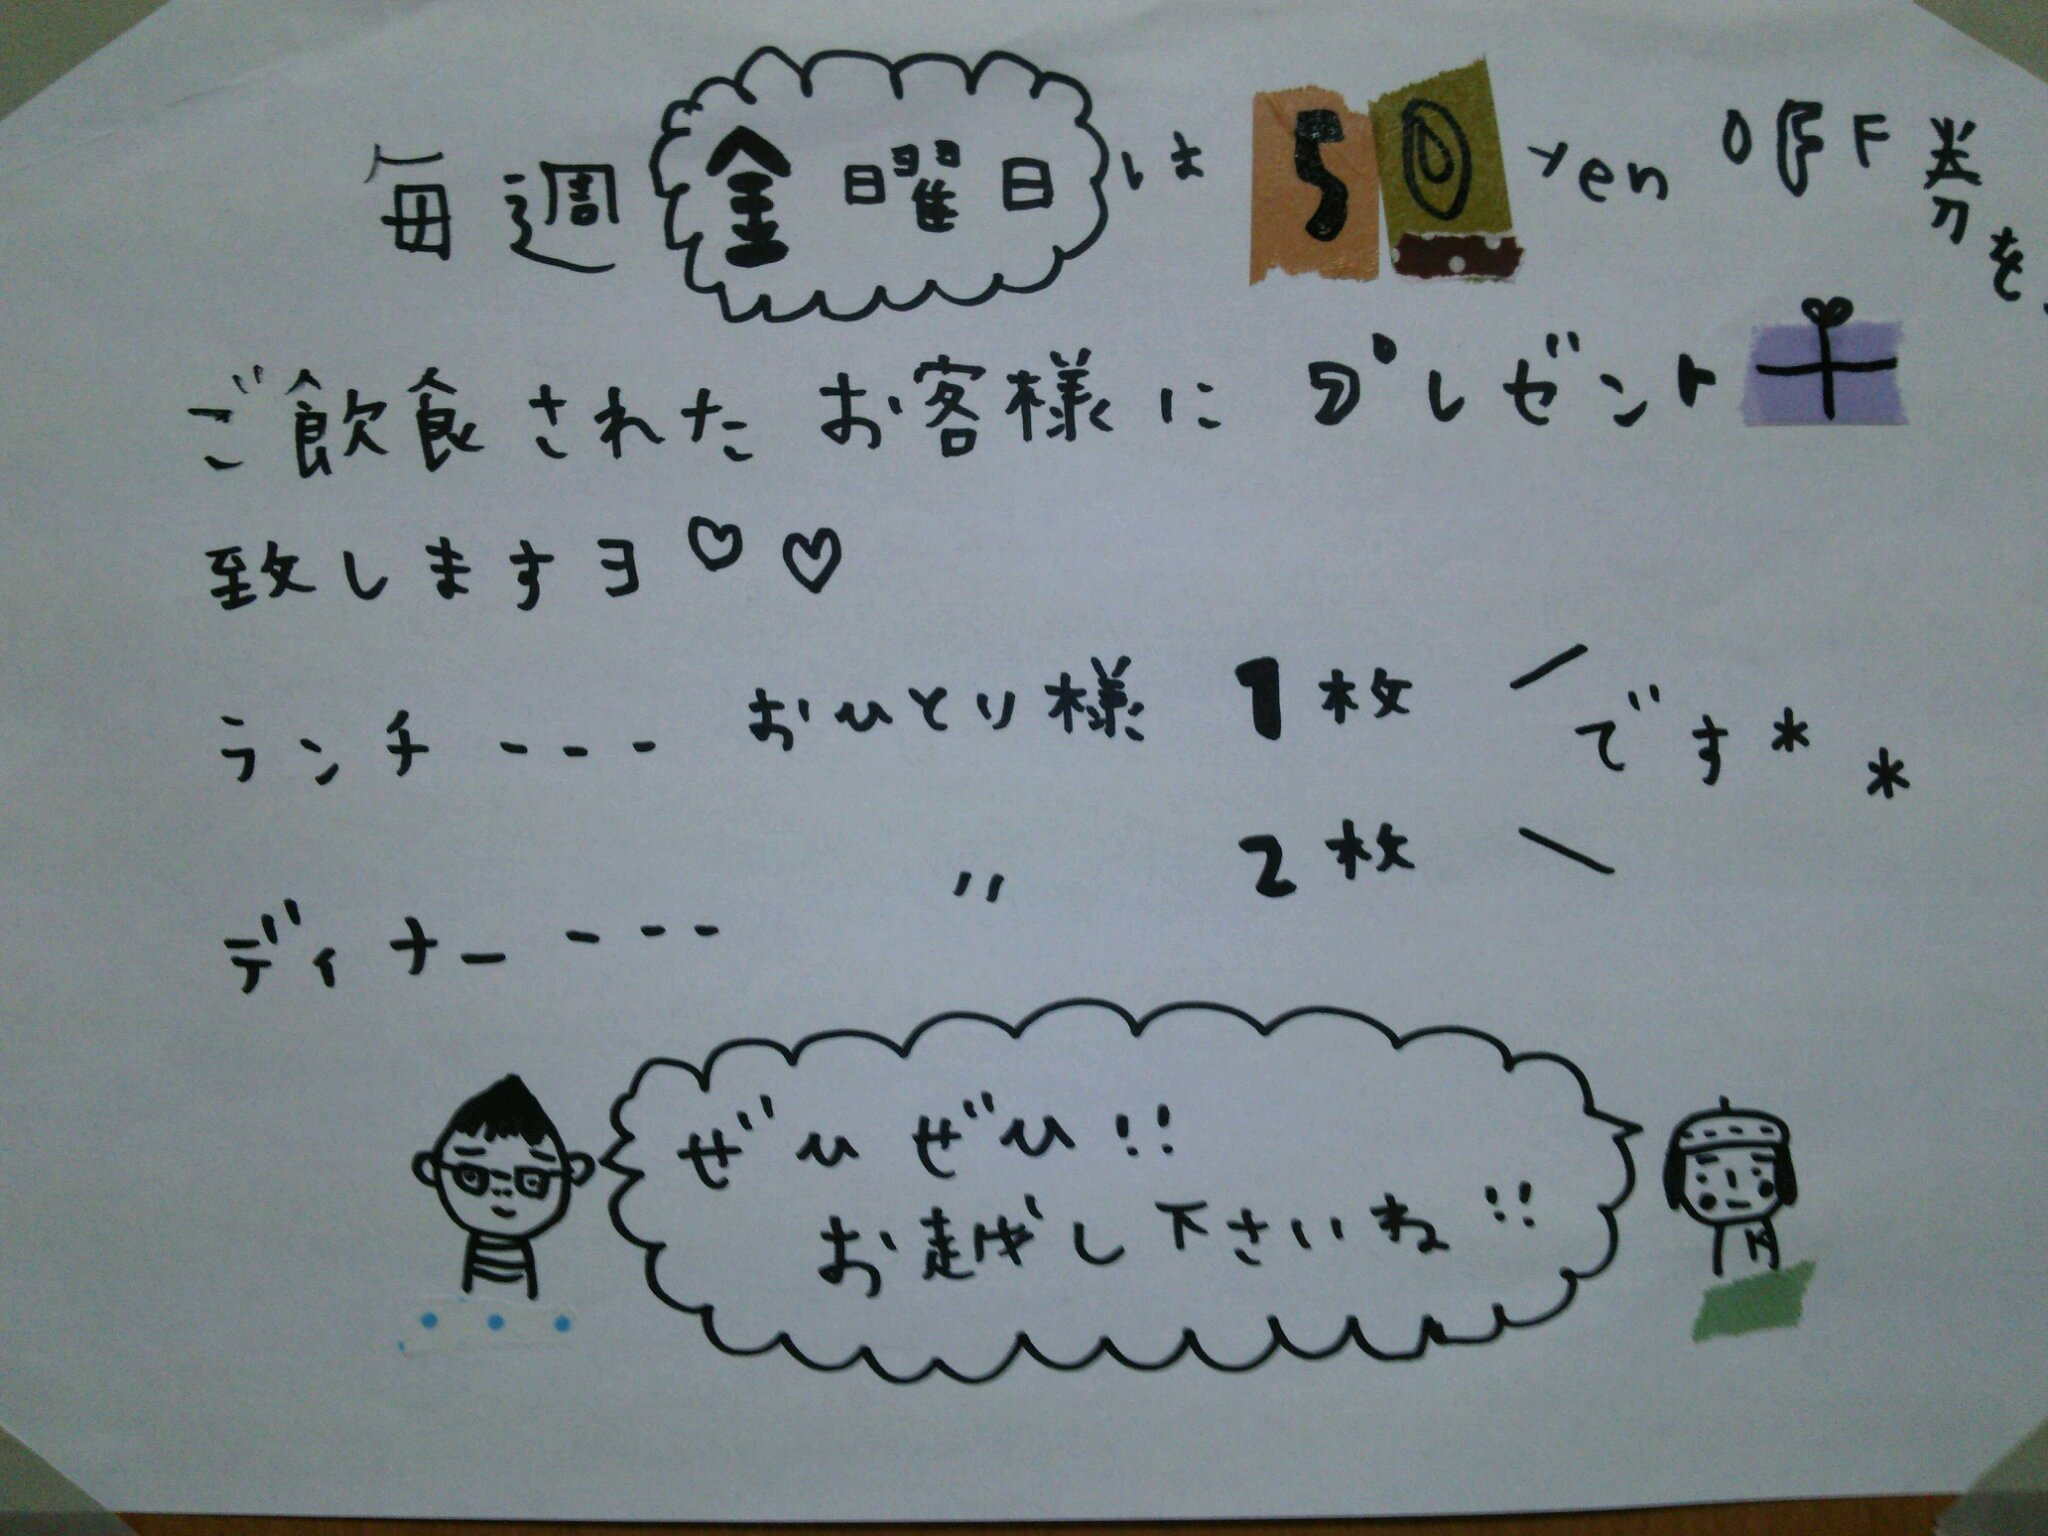 2014-09-19-01-35-31_photo.jpg